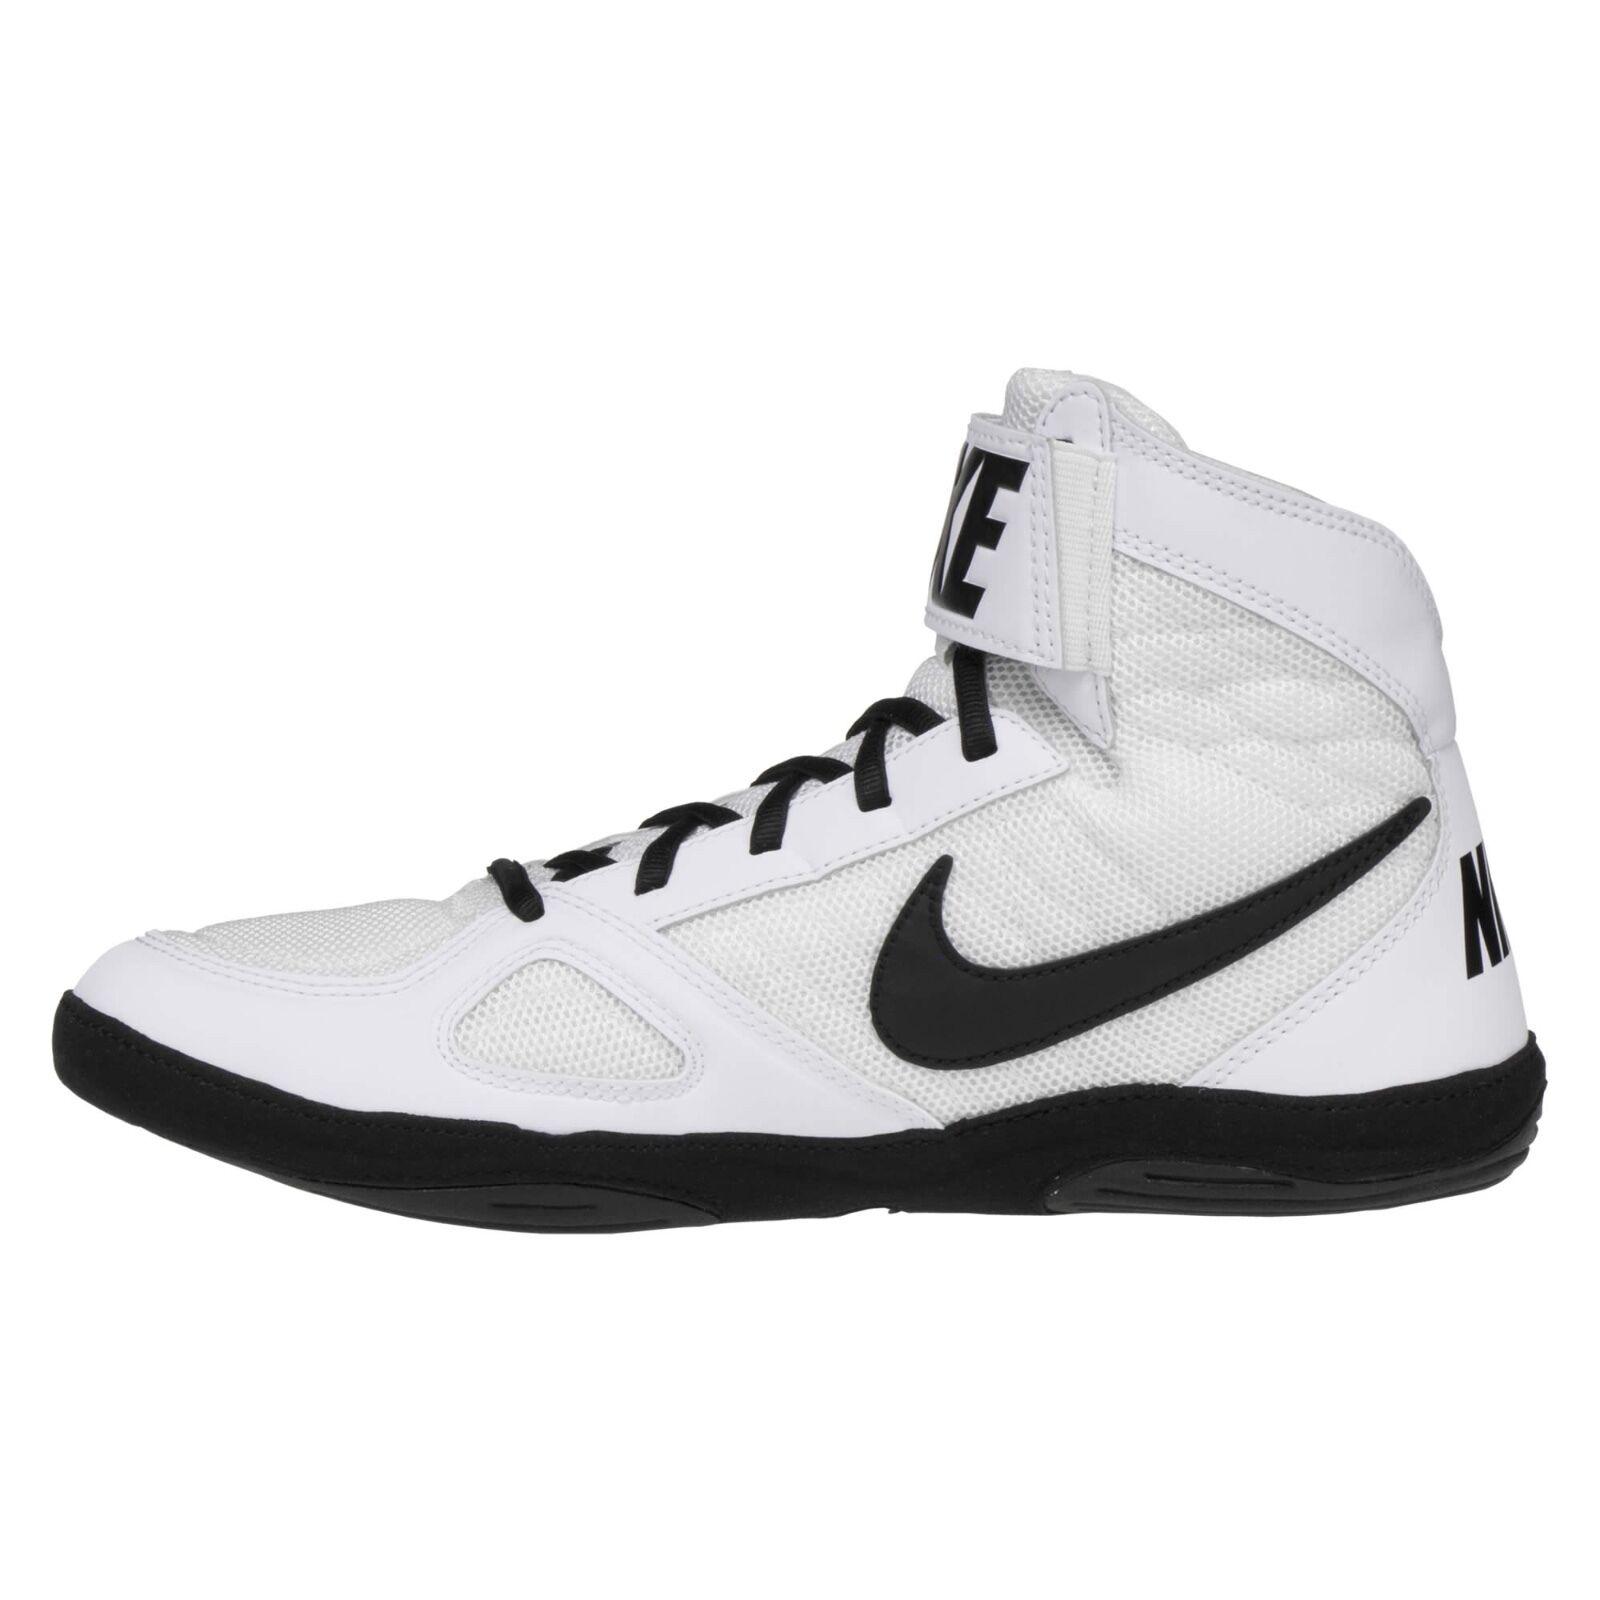 Nike 366640 100 Takedown 4 Men's and Women's Wrestling Shoes men's size 14